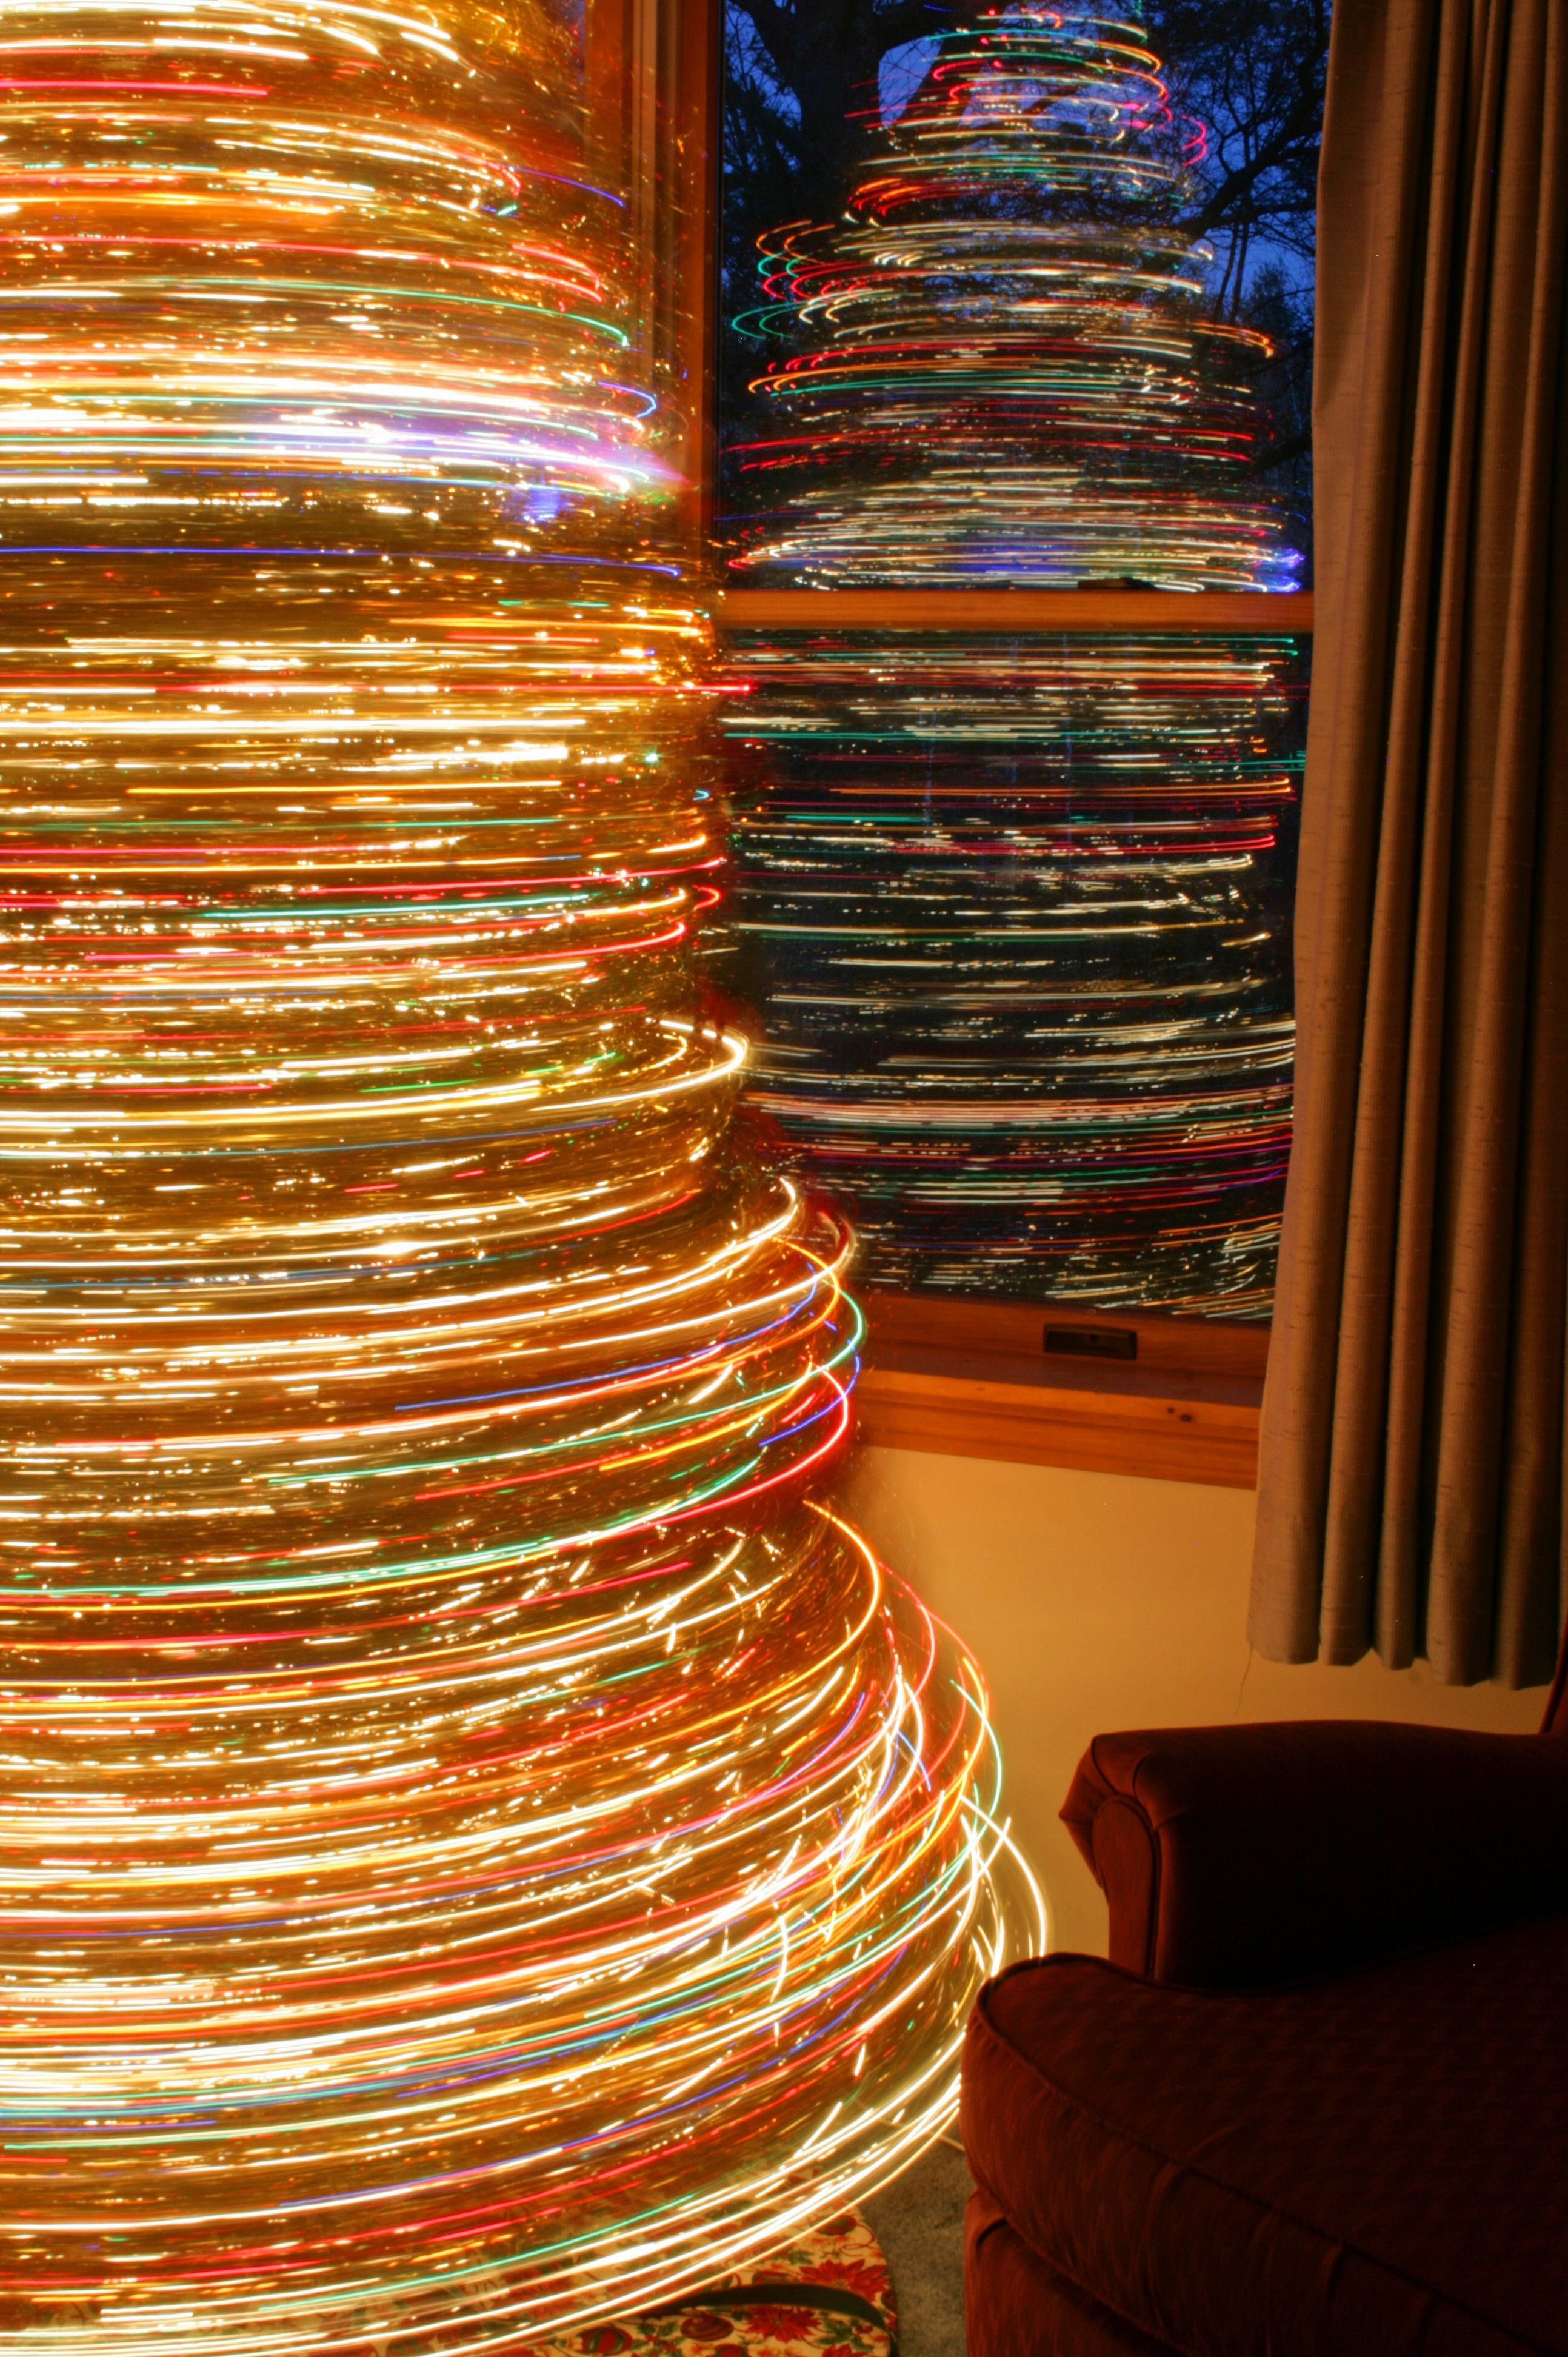 Long exposure plus rotating Christmas tree = cool light trails